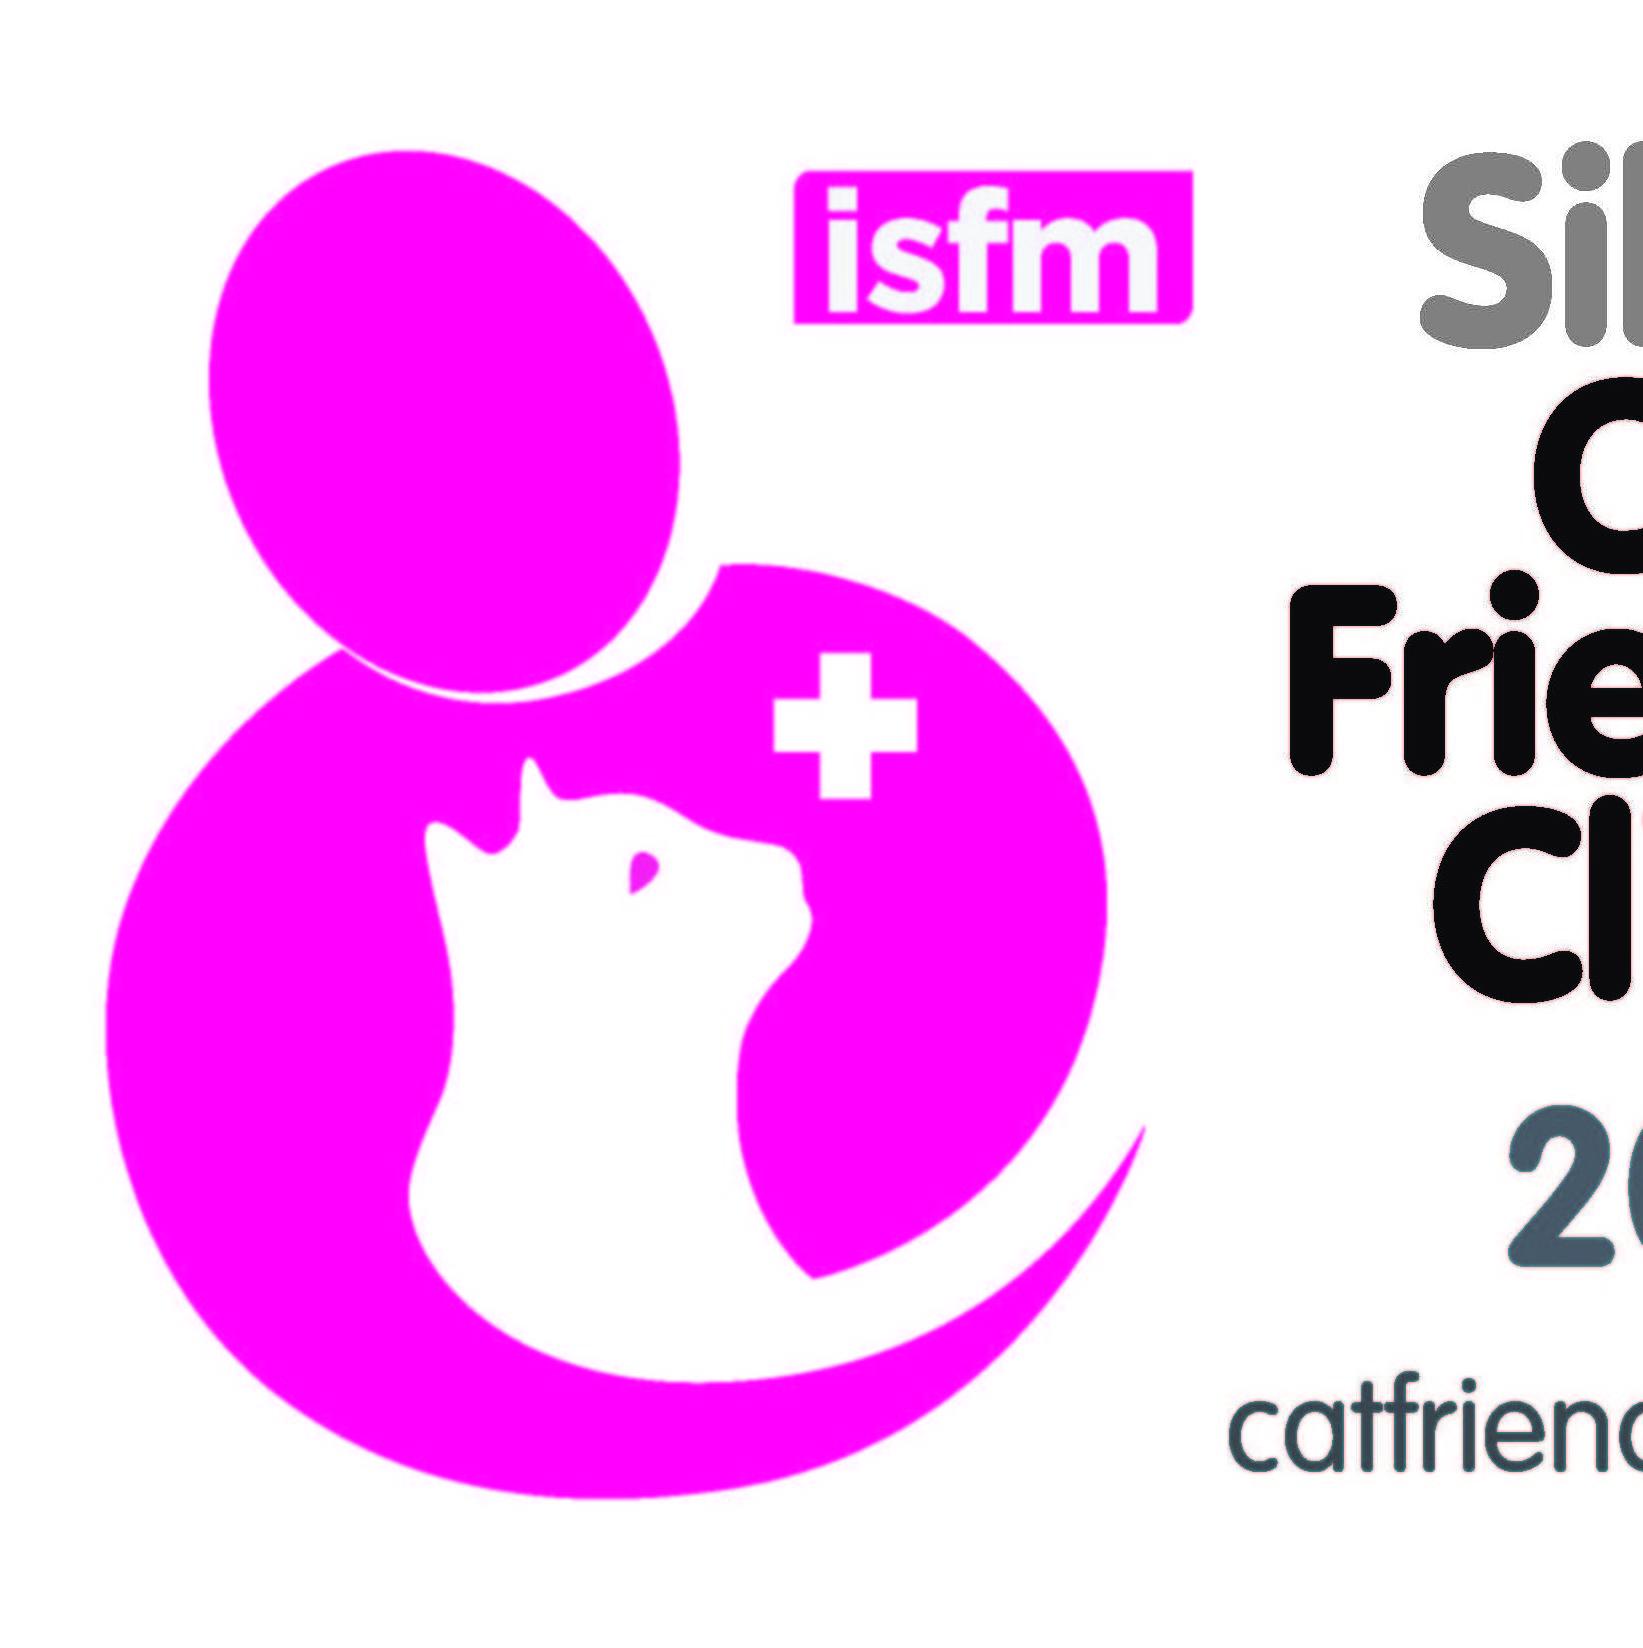 Cat Friendly Clinic Silver - Hospital Amigable con Gatos Plata - ISFM